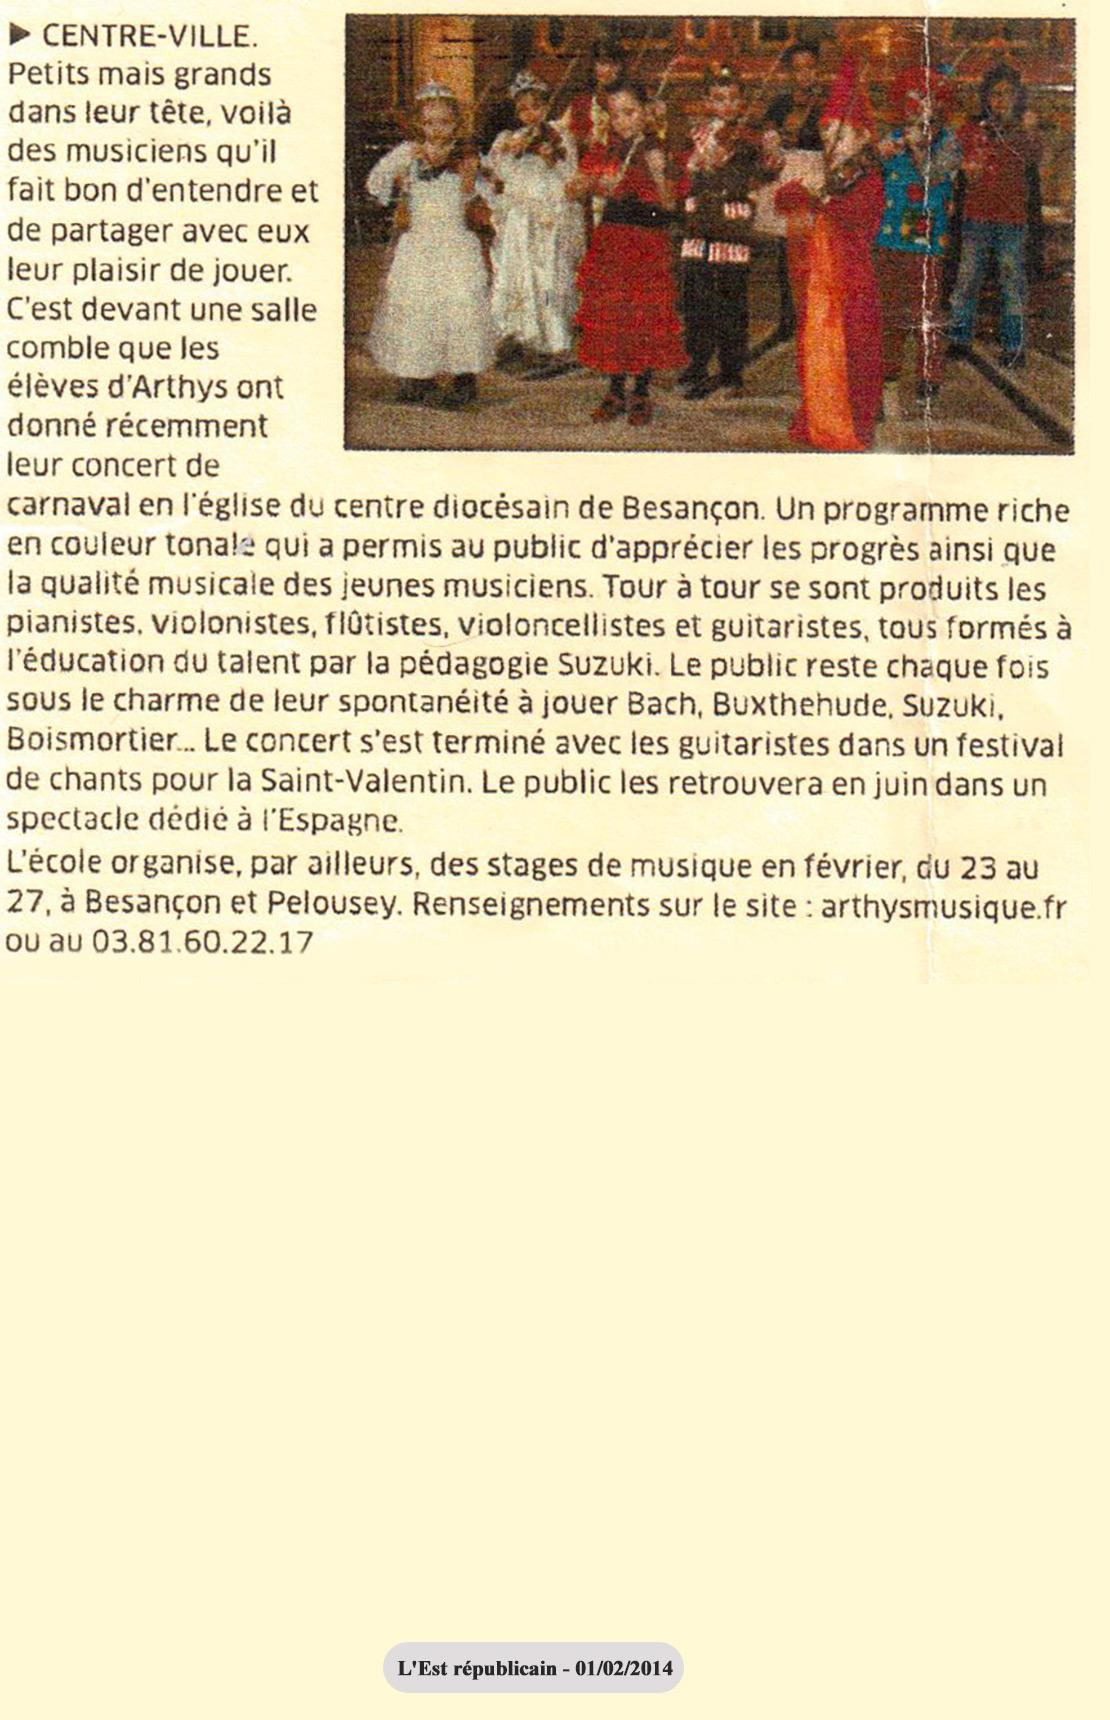 Concert Arthys Musique 2014